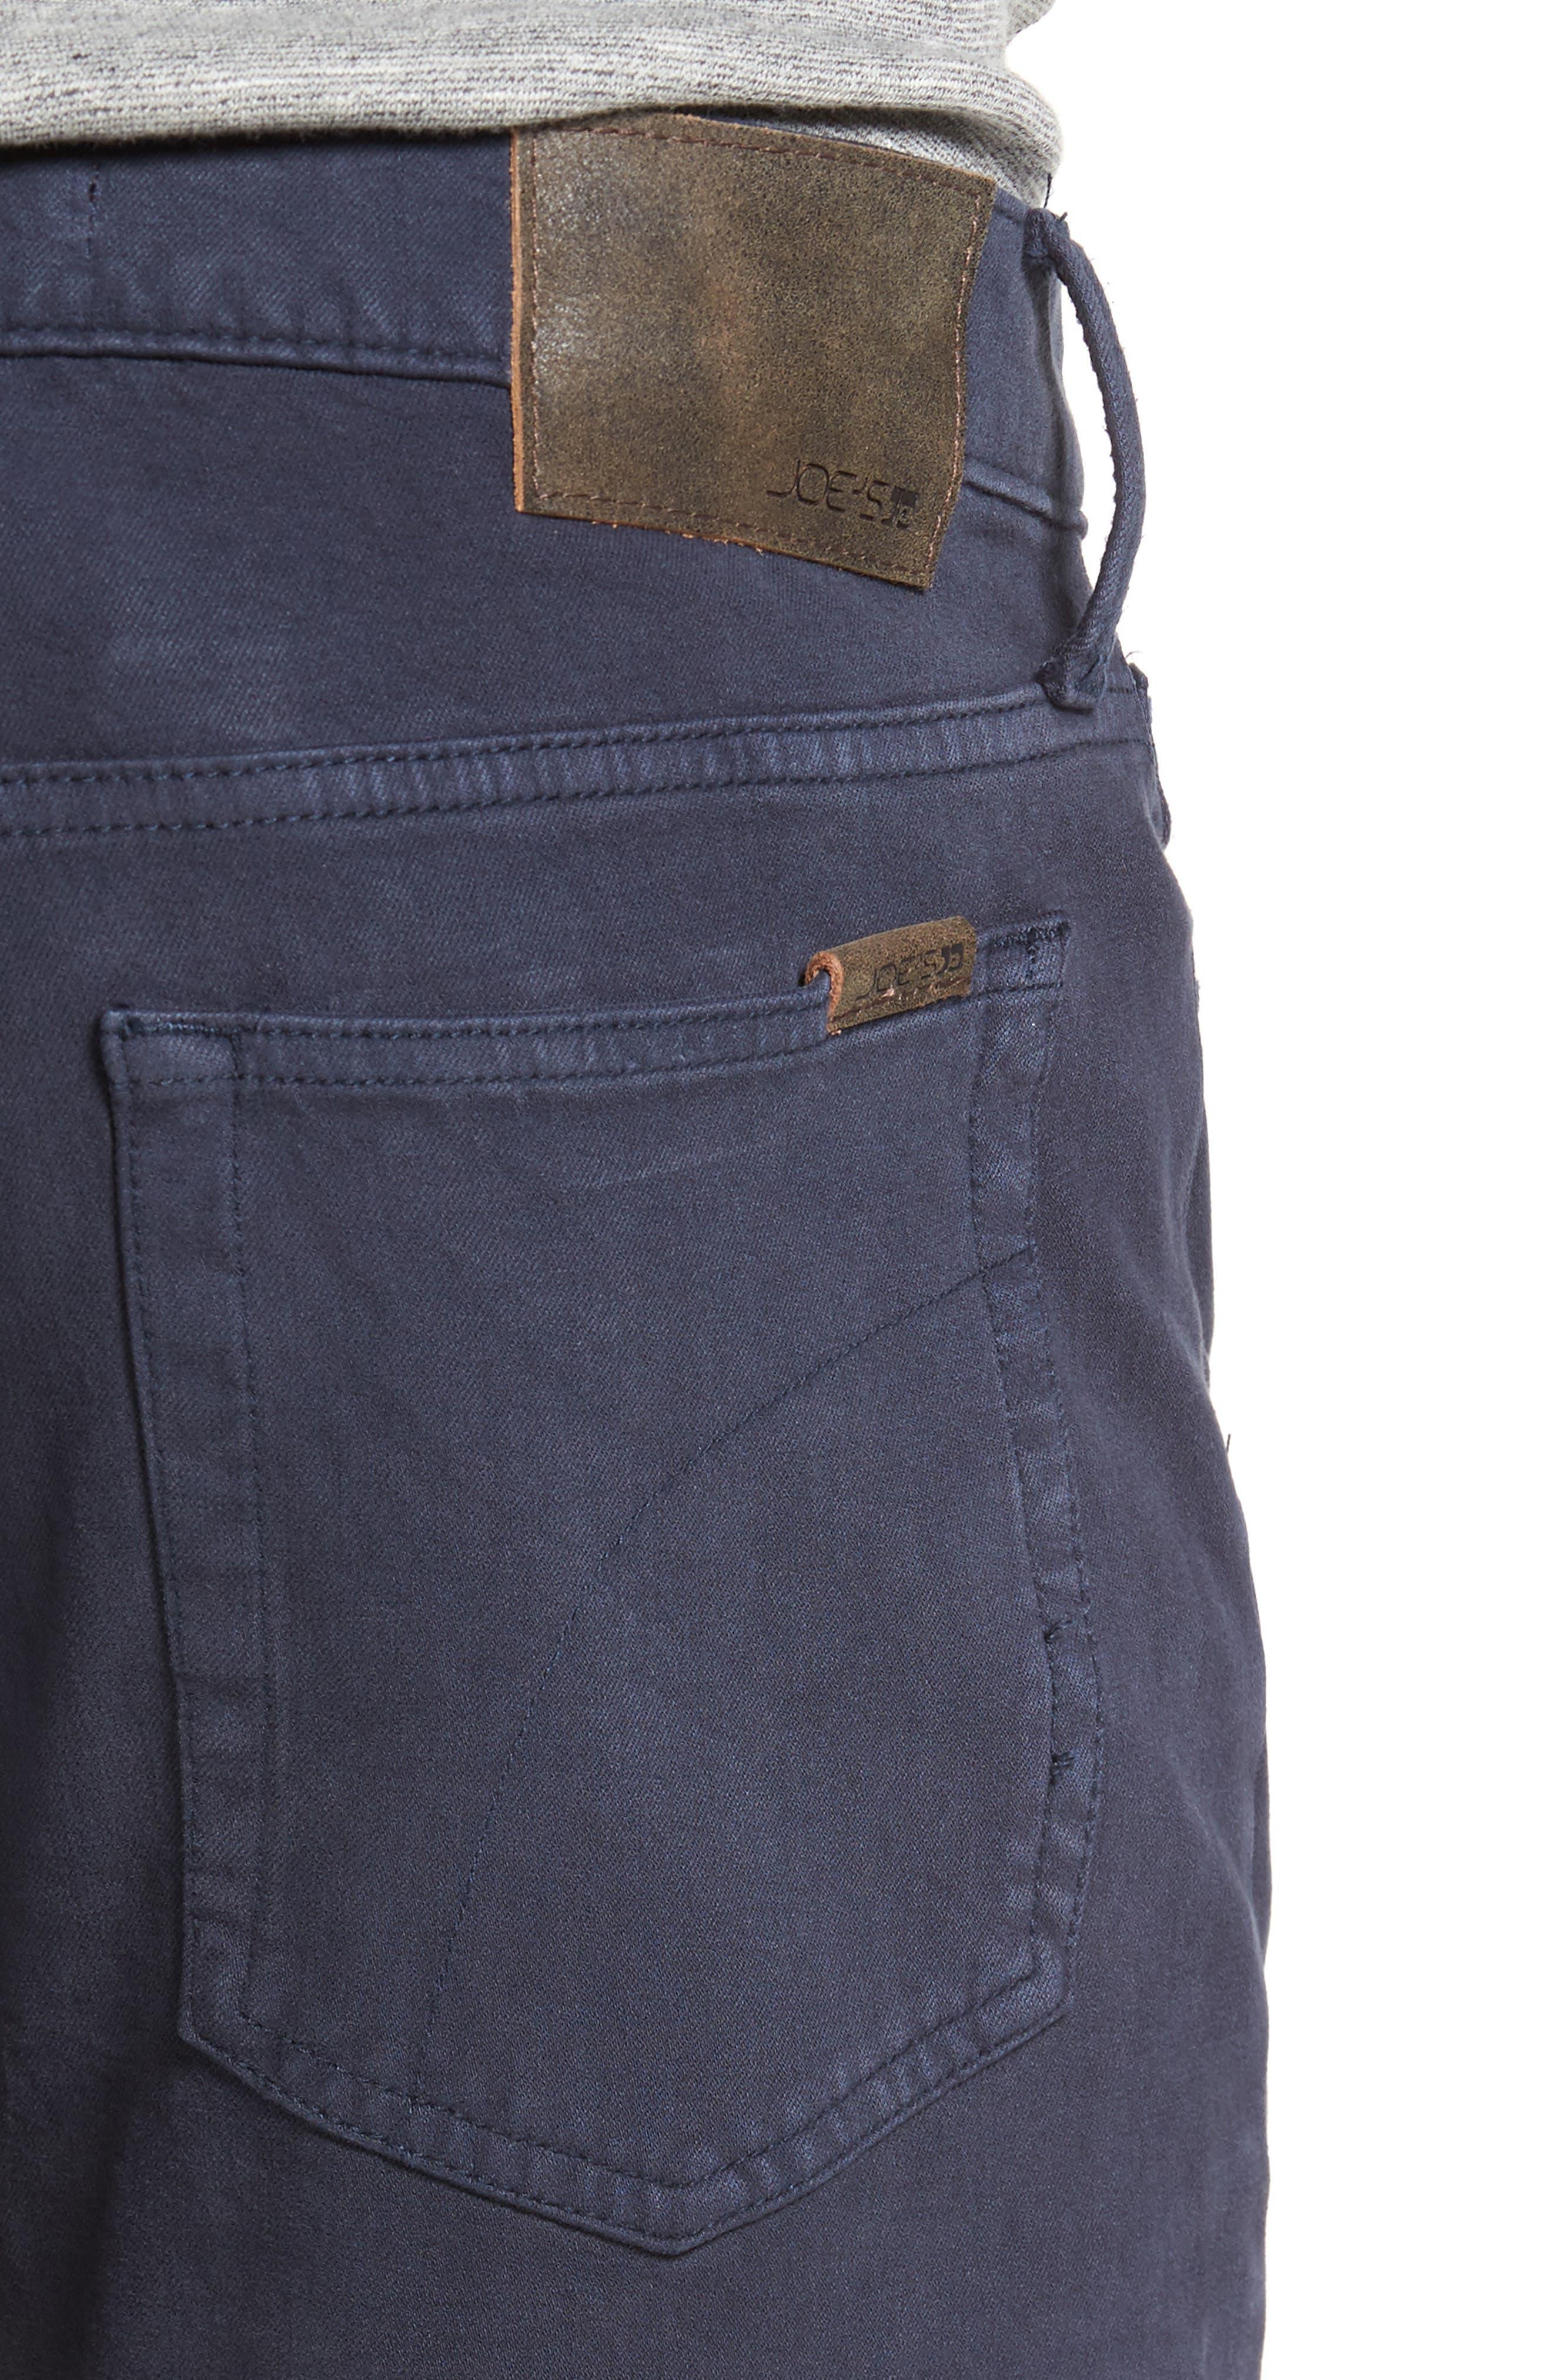 Kinetic Slim Fit Twill Pants,                             Alternate thumbnail 4, color,                             NAVY